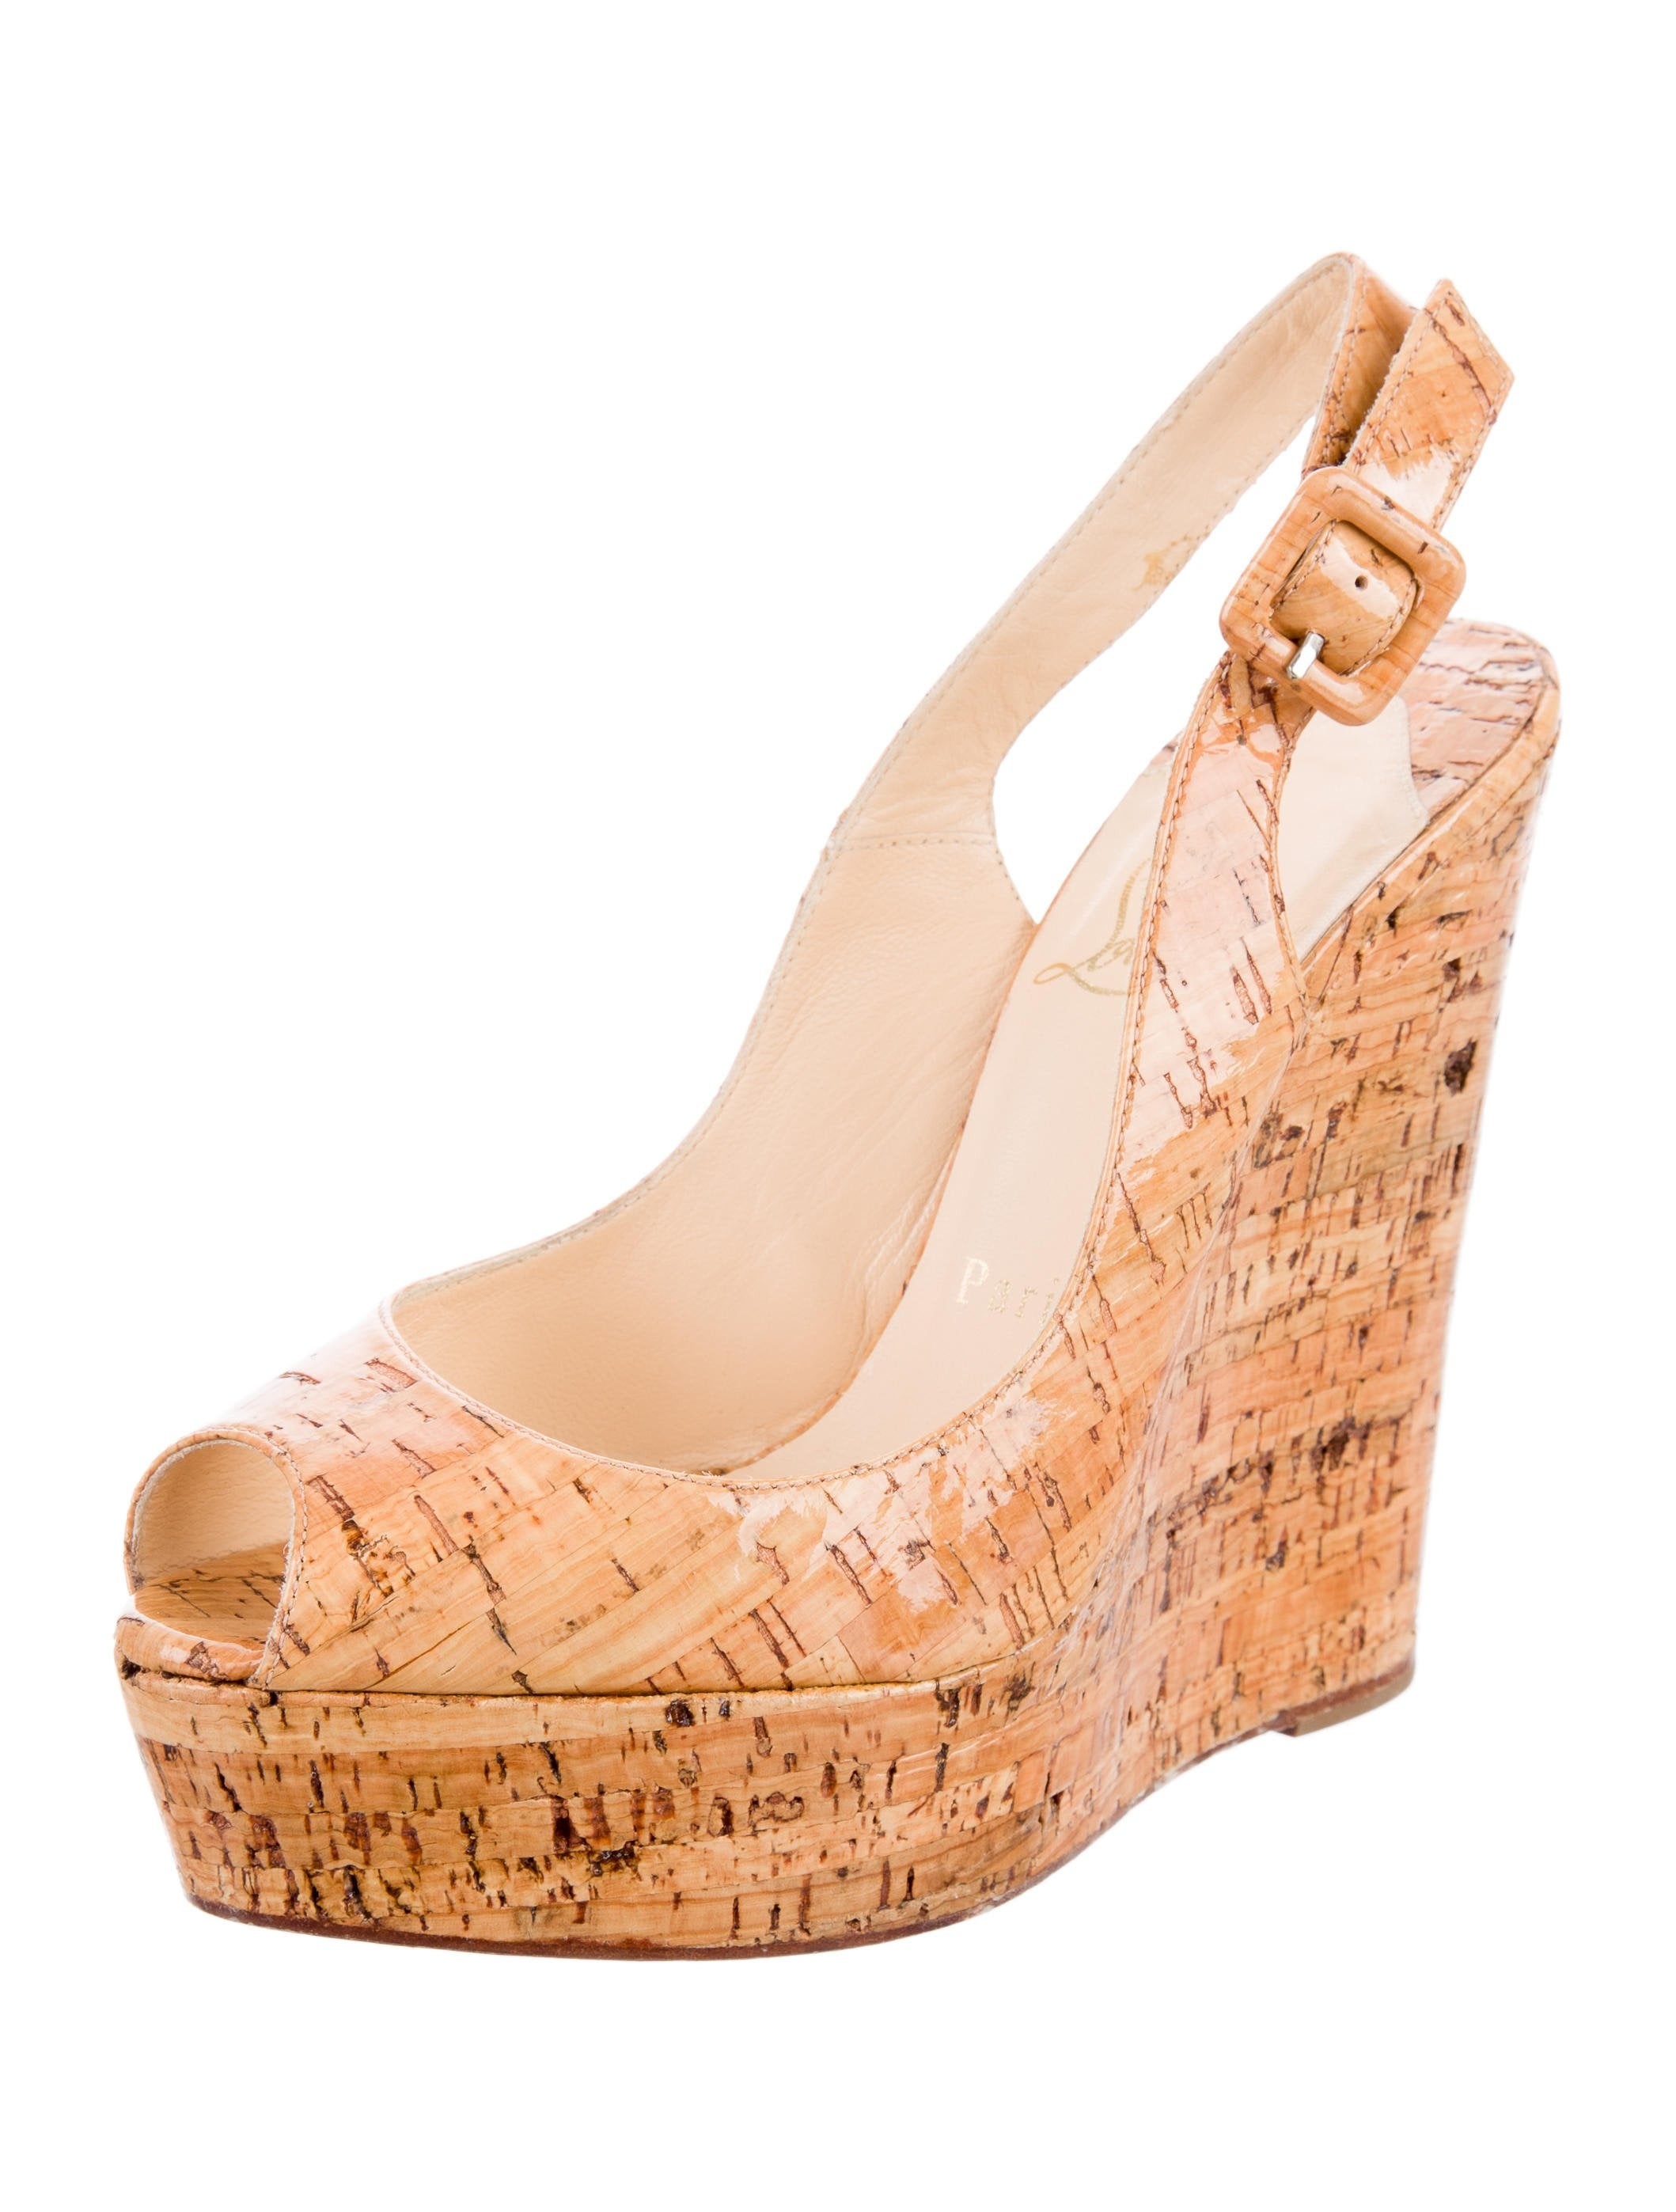 Christian Louboutin Cork Slingback Wedges Shoes